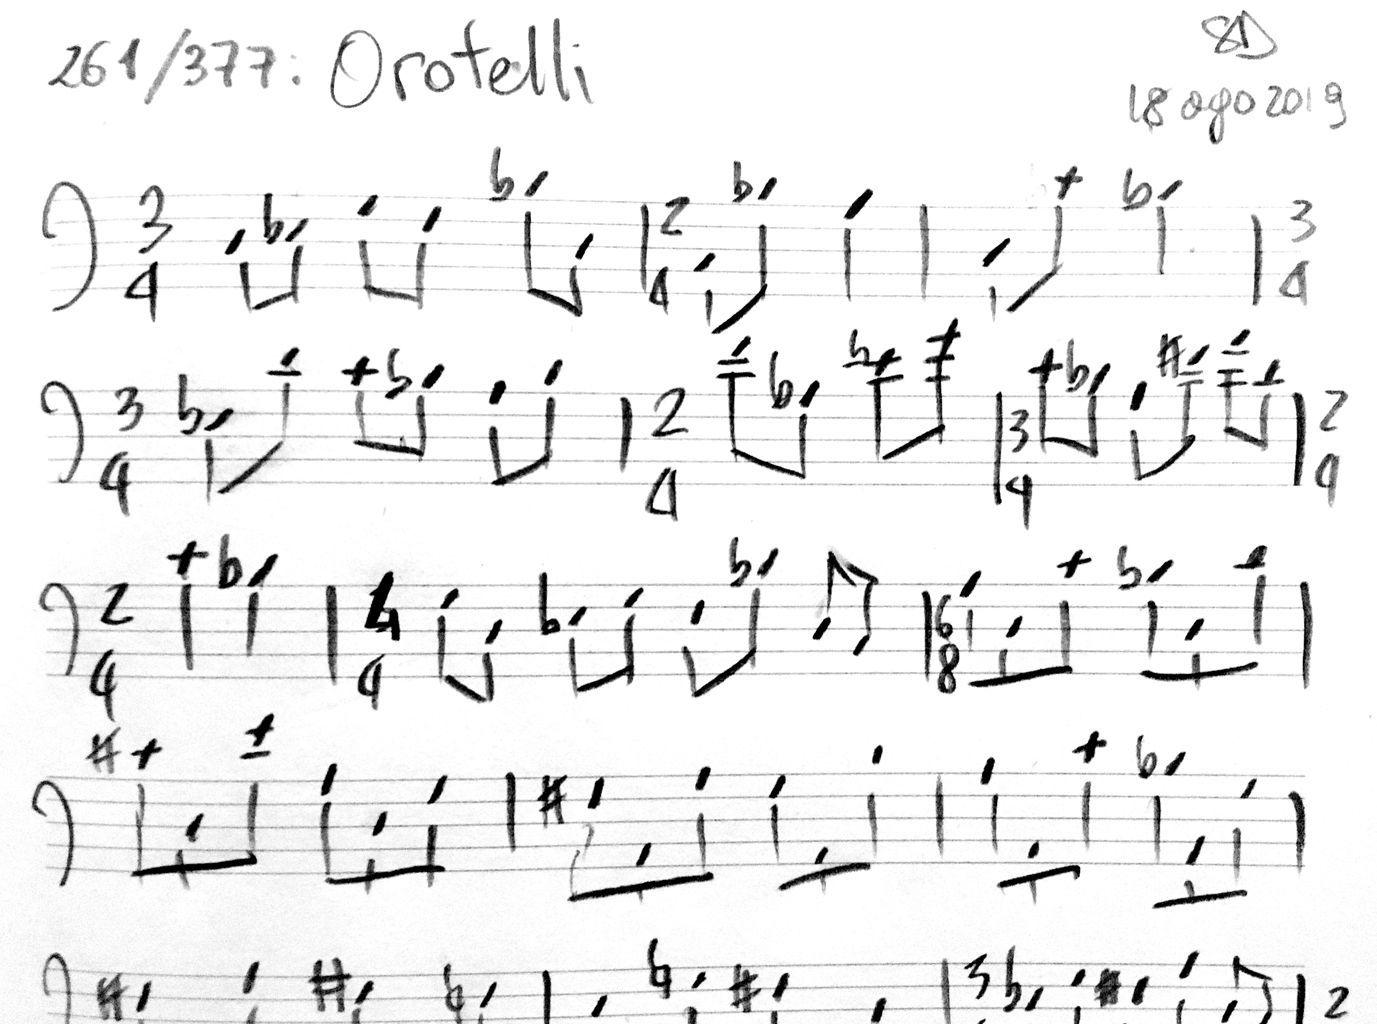 261-Orotelli-score